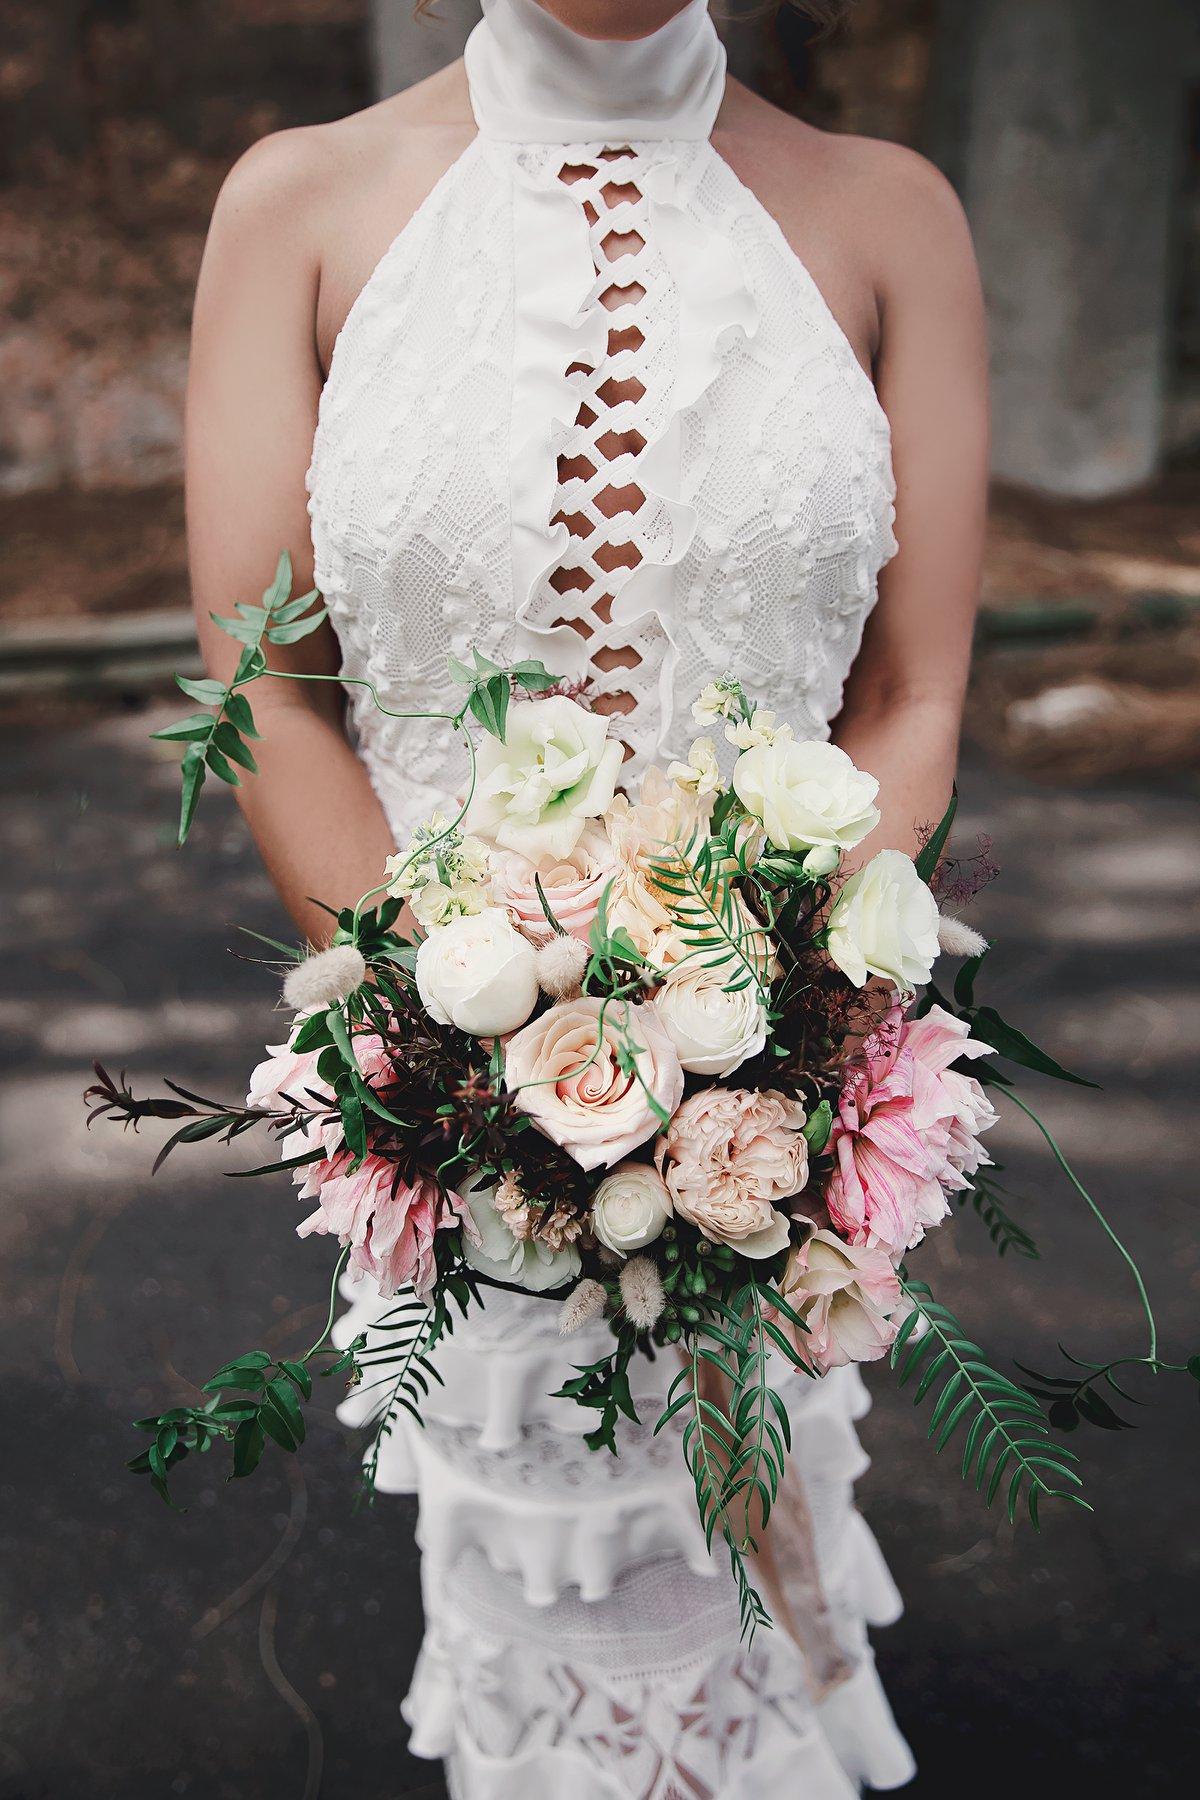 Brides Bouquet Little Manly Point.jpg